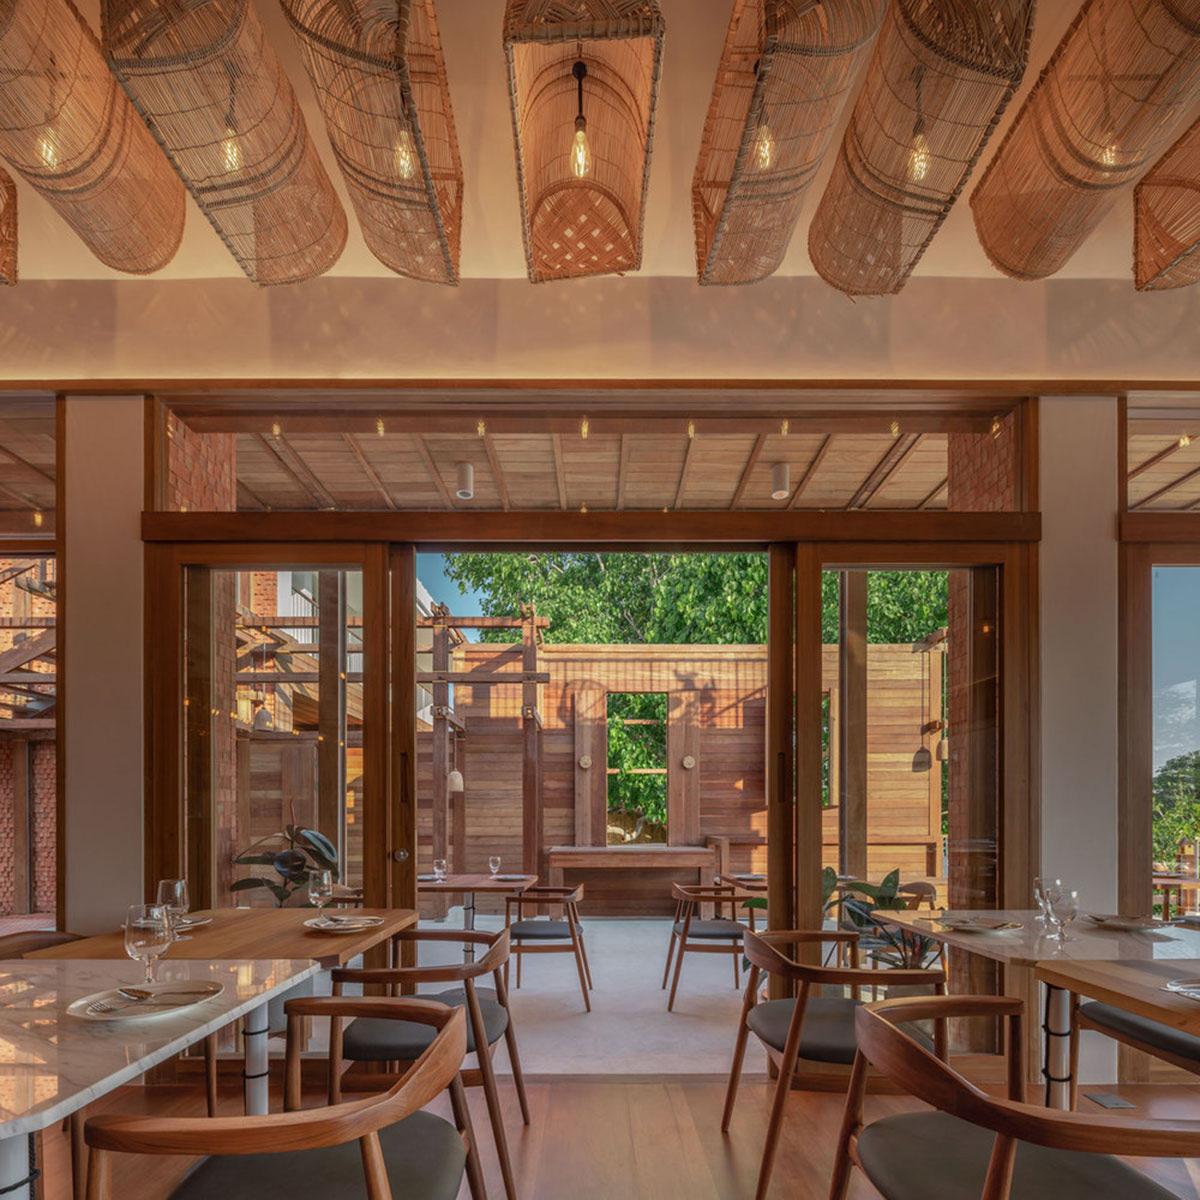 Baan-Pomphet-Hotel-Restaurant-onion-Wison-Tungthumya-06